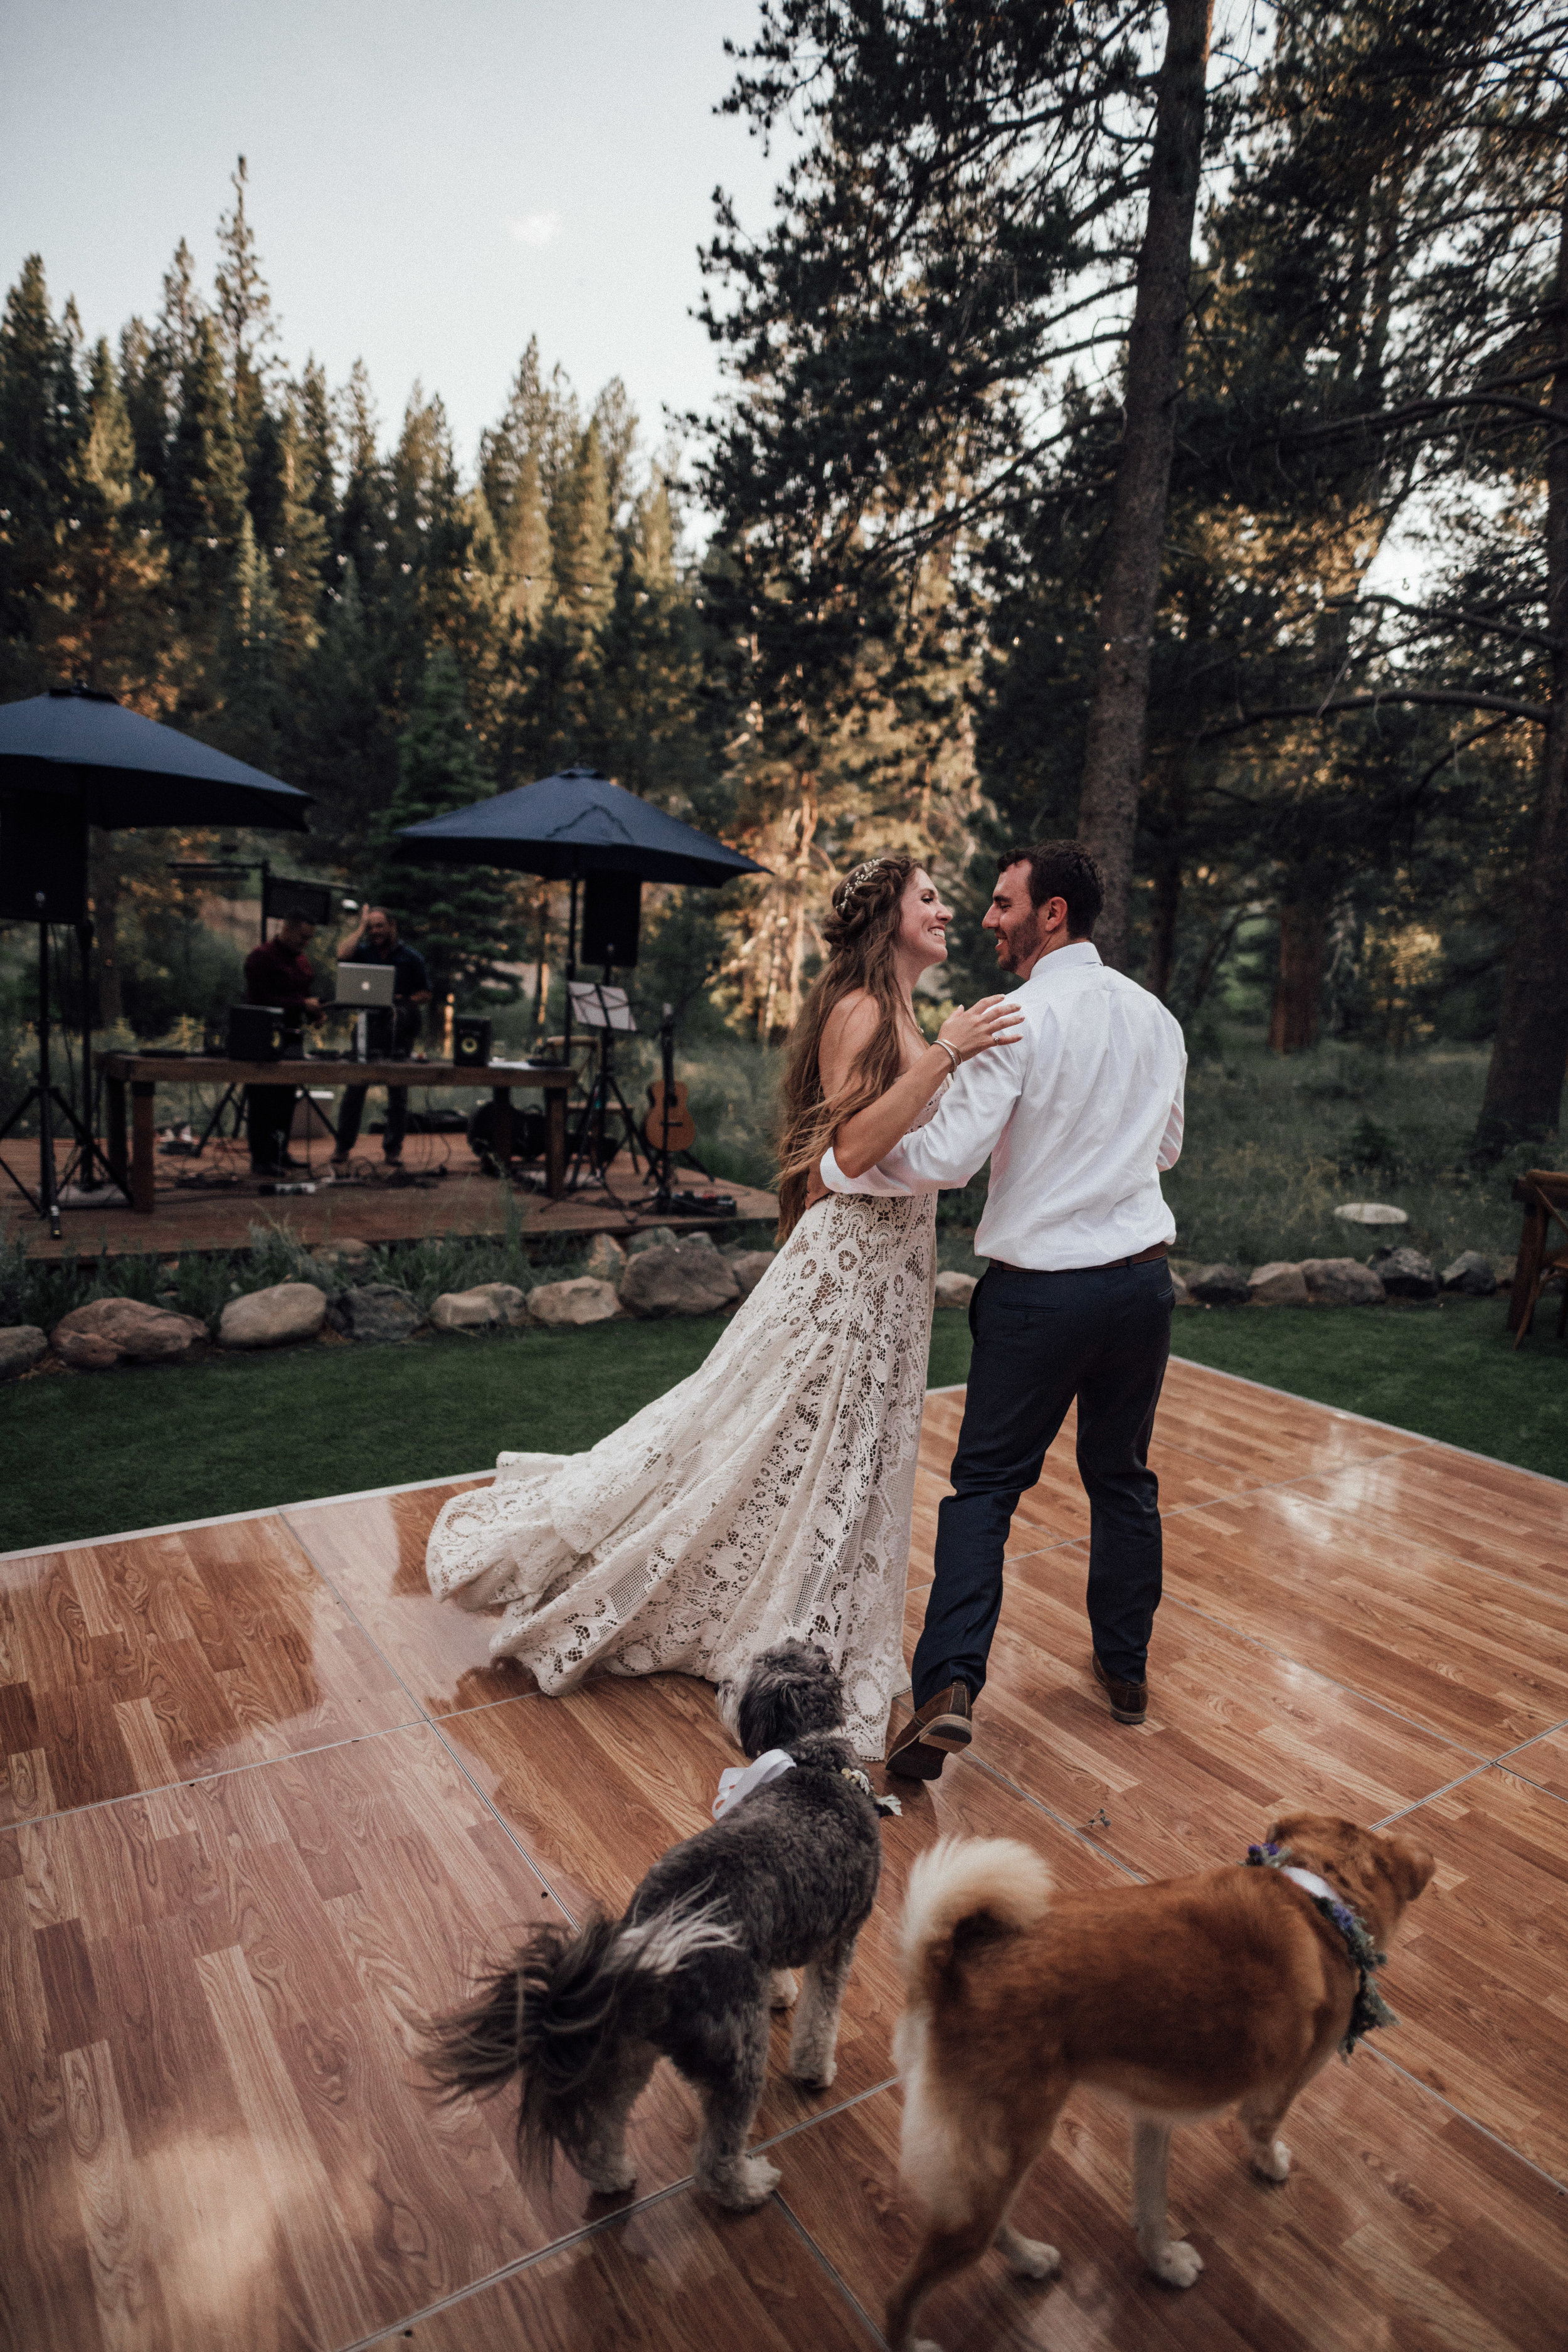 may-wedding-dancing-pines-sierraville-wedding-ca-danielle-kyle-junebug-photography-lake-tahoe-1-2257.jpg